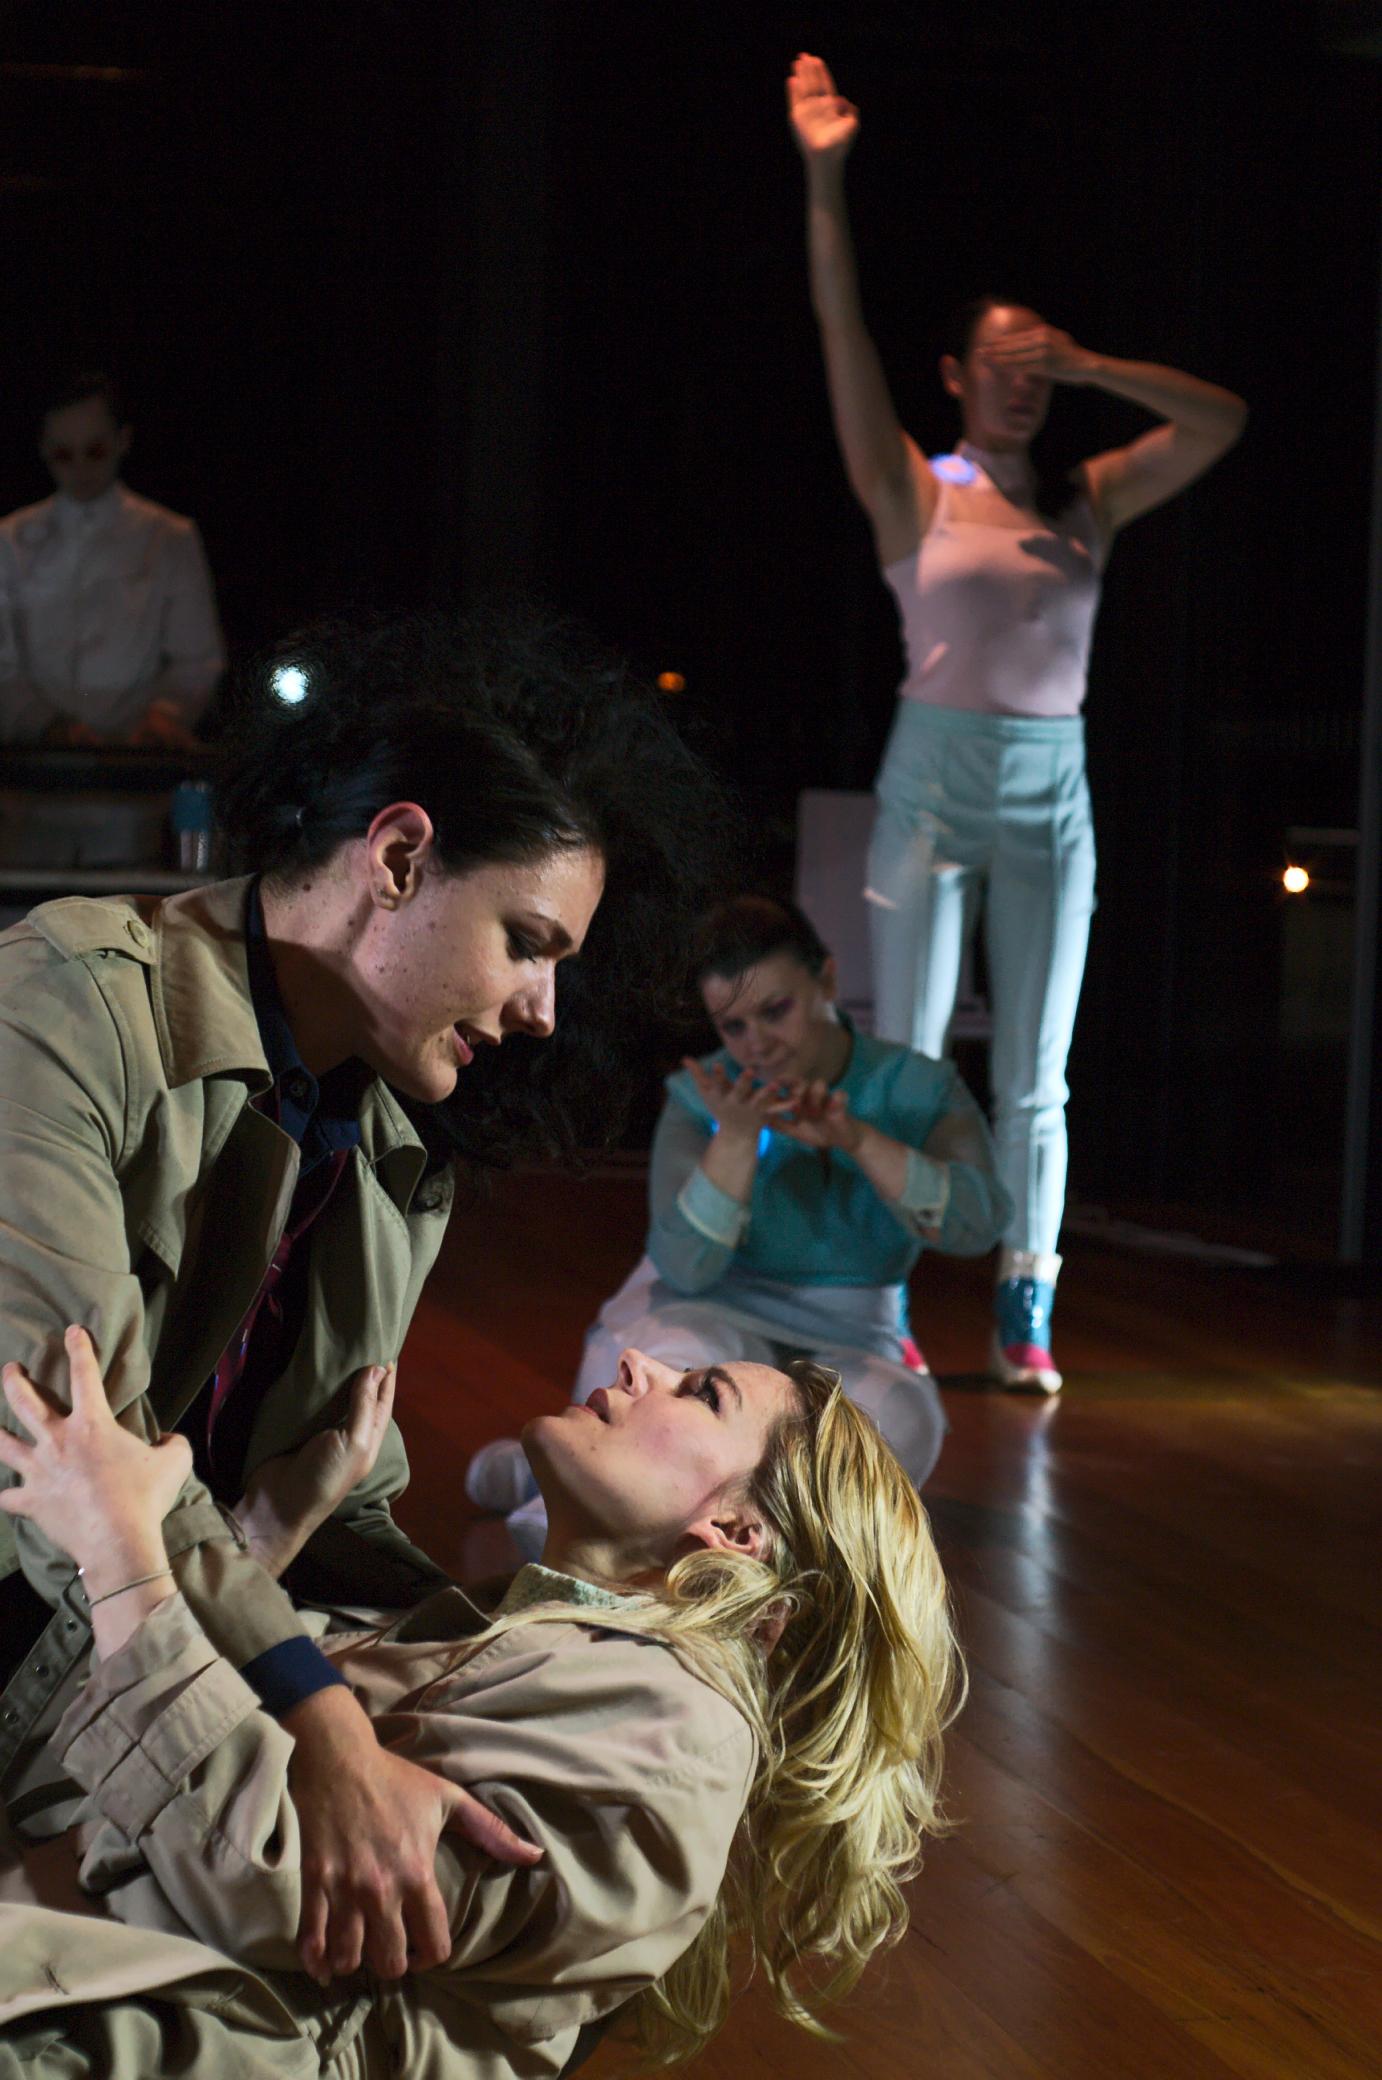 Jasper Garner Gore, Amy Scott-Smith, Katrina Rautenberg, Emily Elise and Jennifer White. Photo by Sasha Cohen.